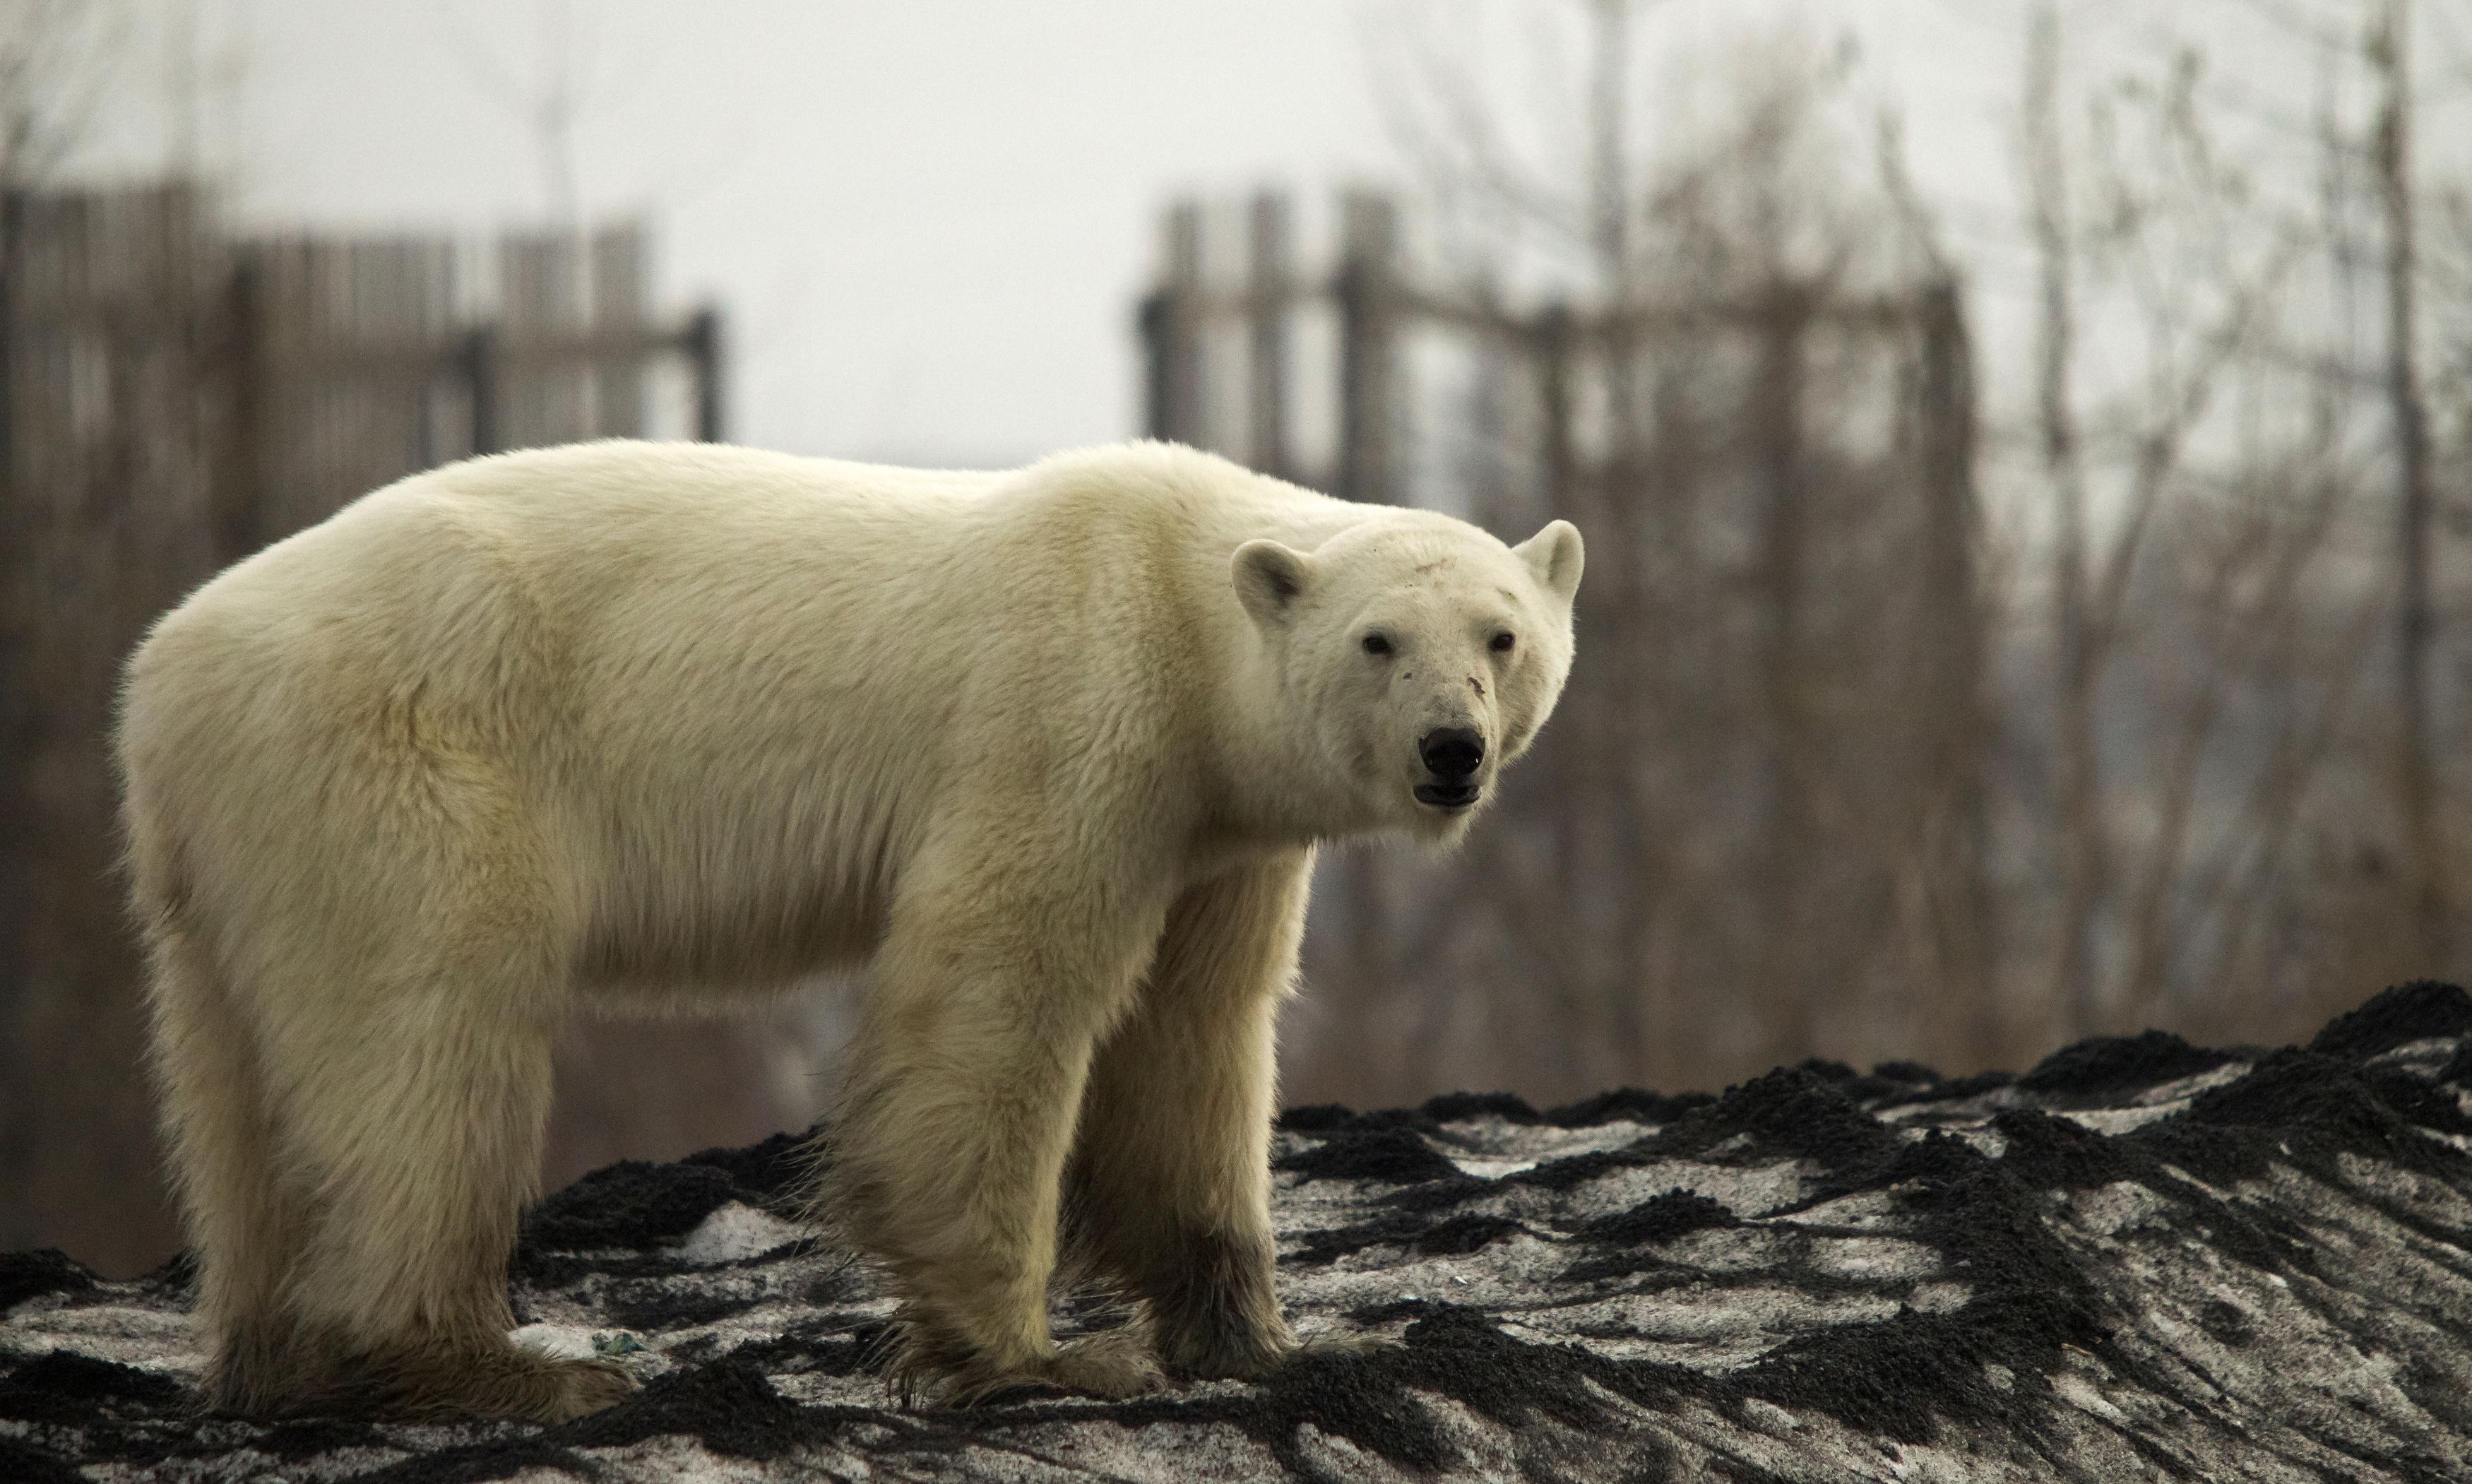 Stricken polar bear turns up in Siberian city, hundreds of miles from home